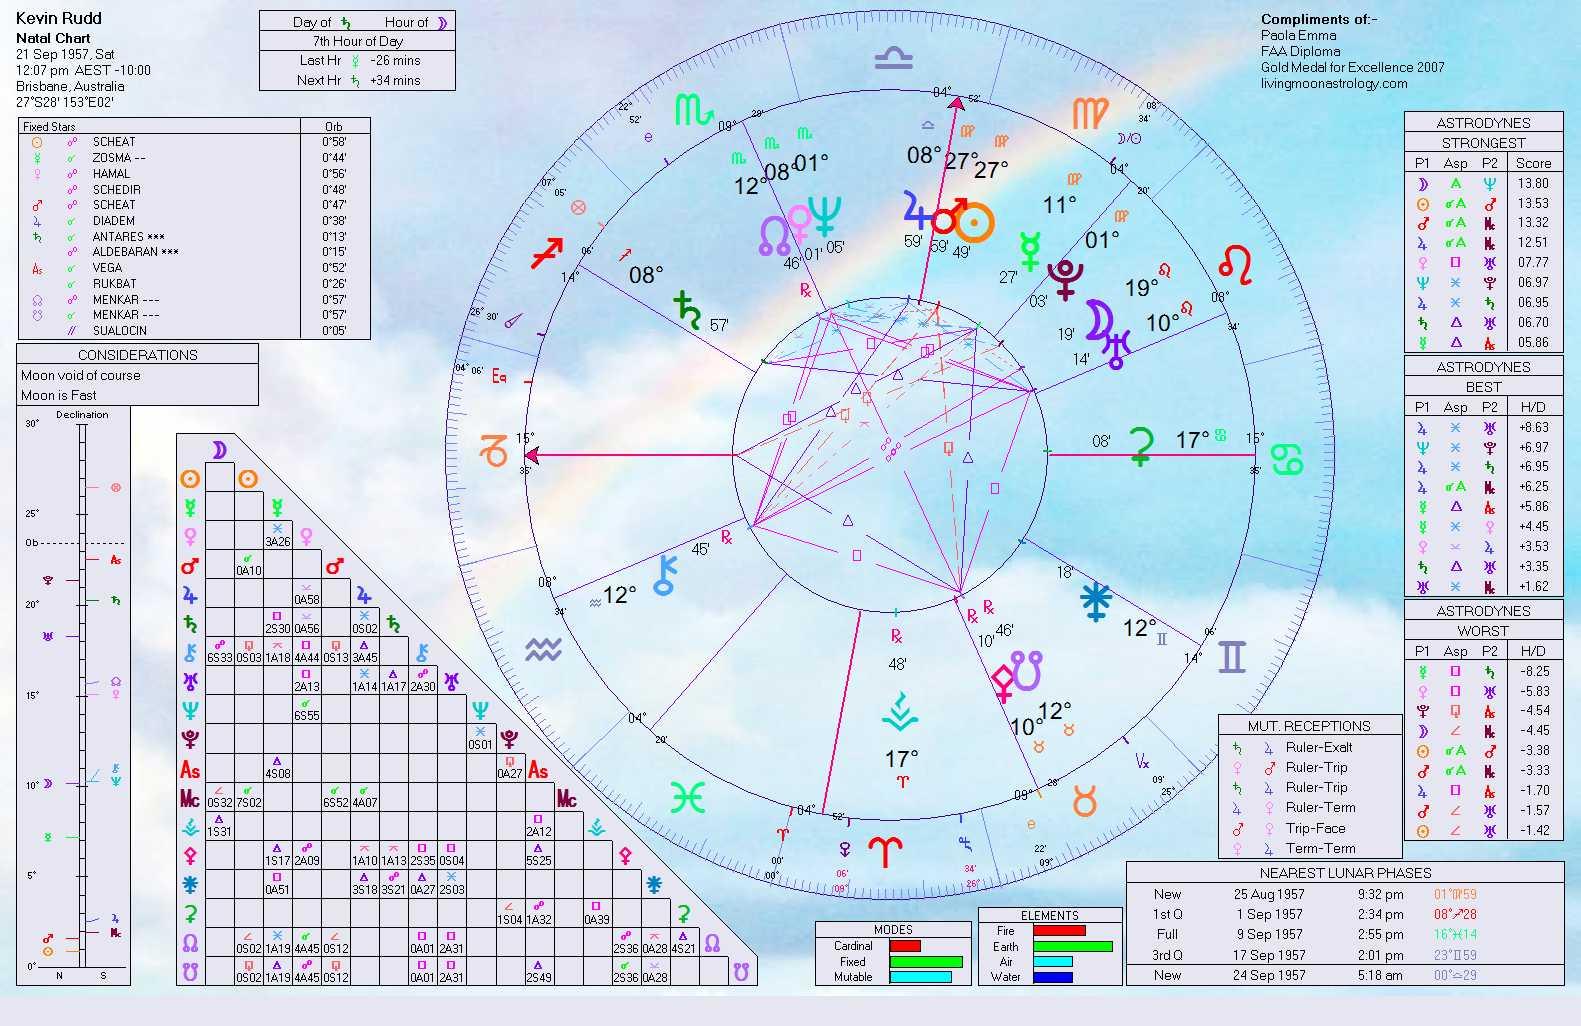 Meryl streep birth chart gallery free any chart examples kevin rudd birth chart home of livingmoonastrology the astrology of the rudd gillards saga kevin rudd nvjuhfo Choice Image